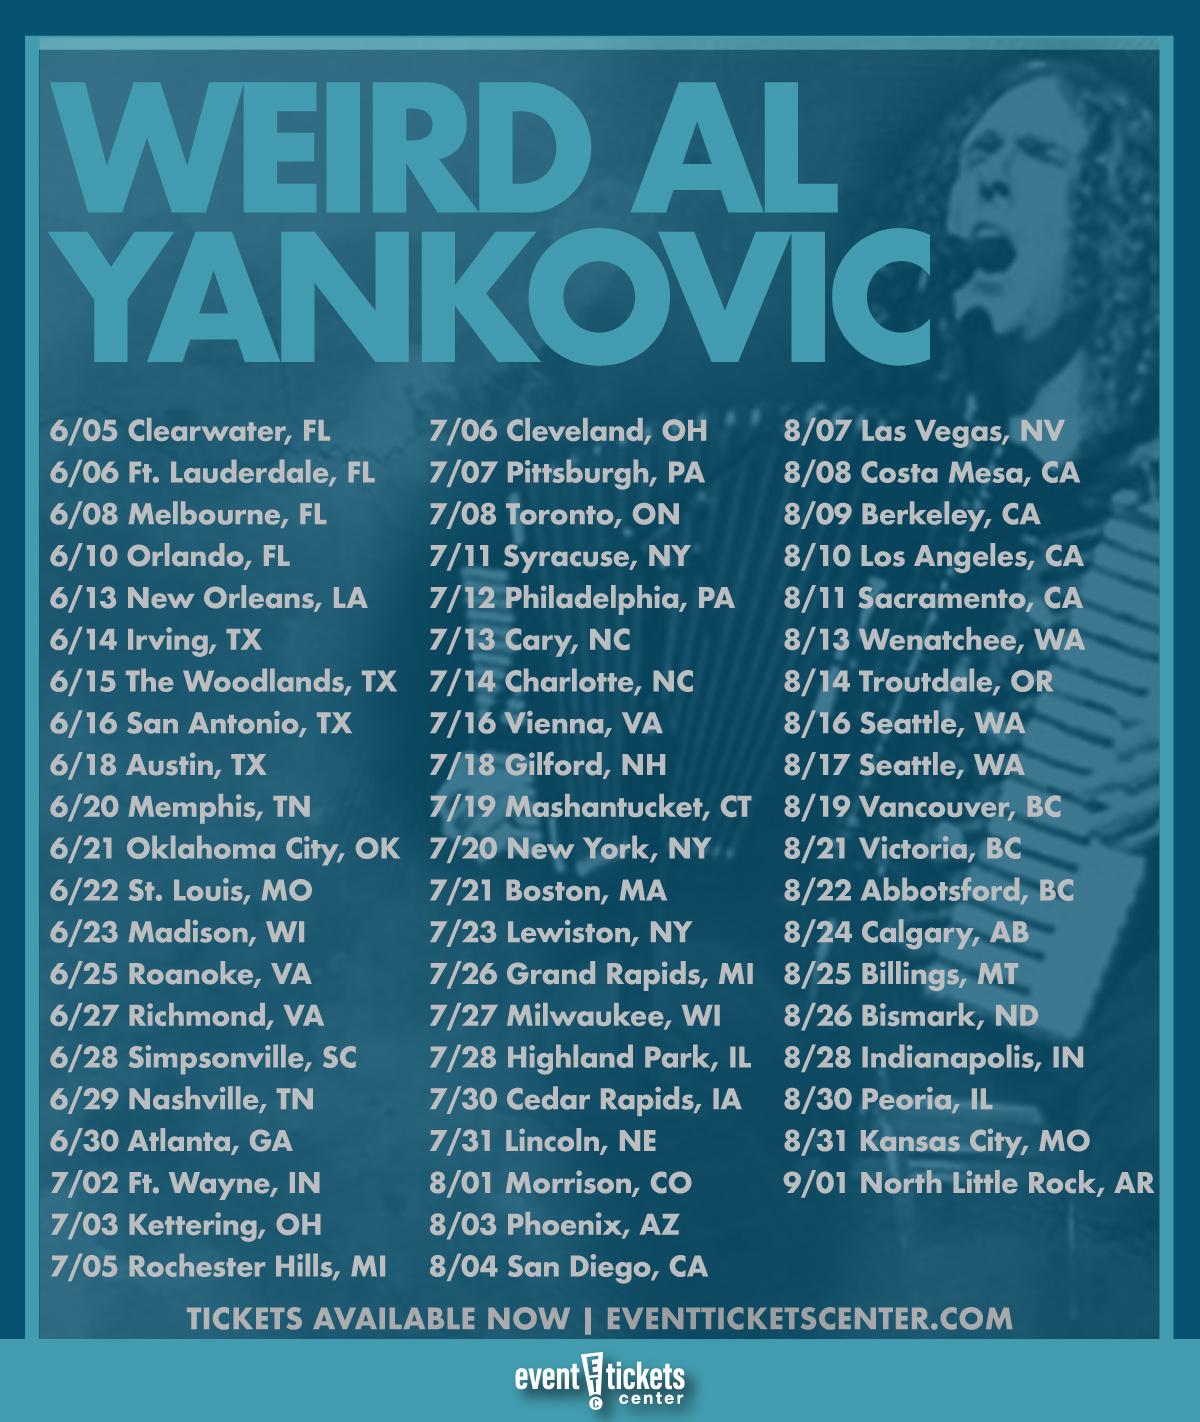 weird al yankovic tour dates